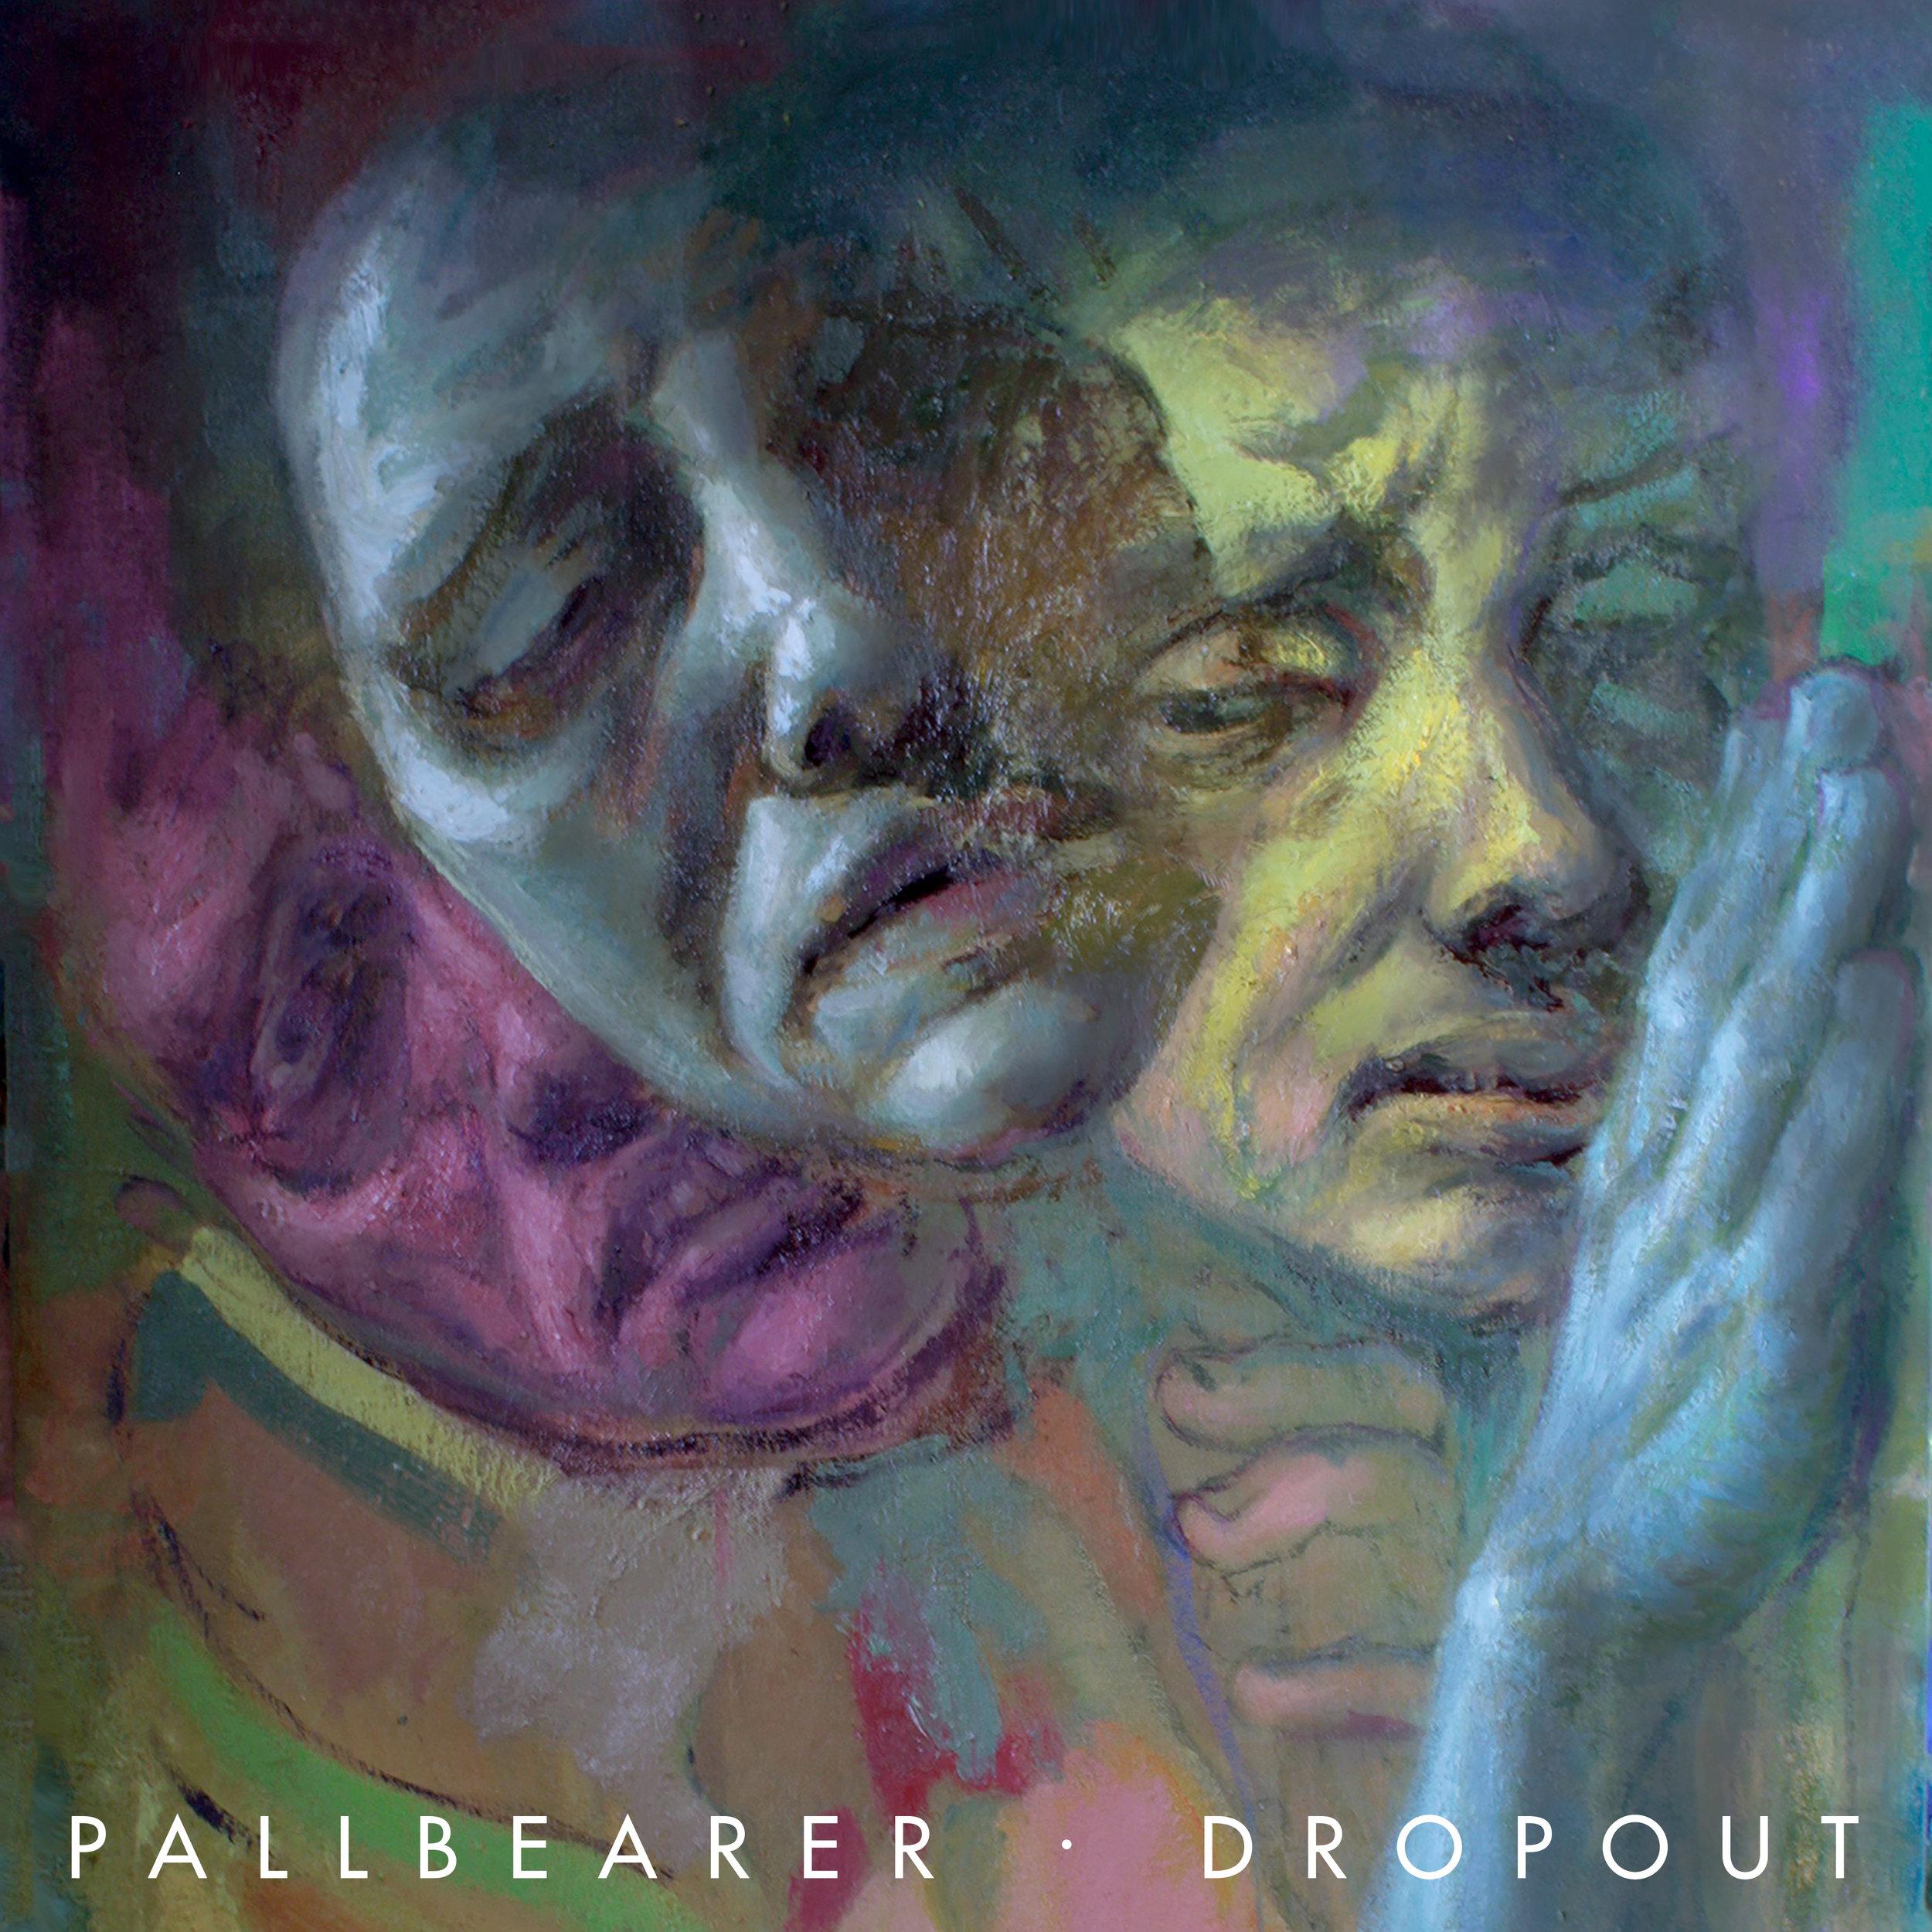 Pallbearer Dropout cover.jpg